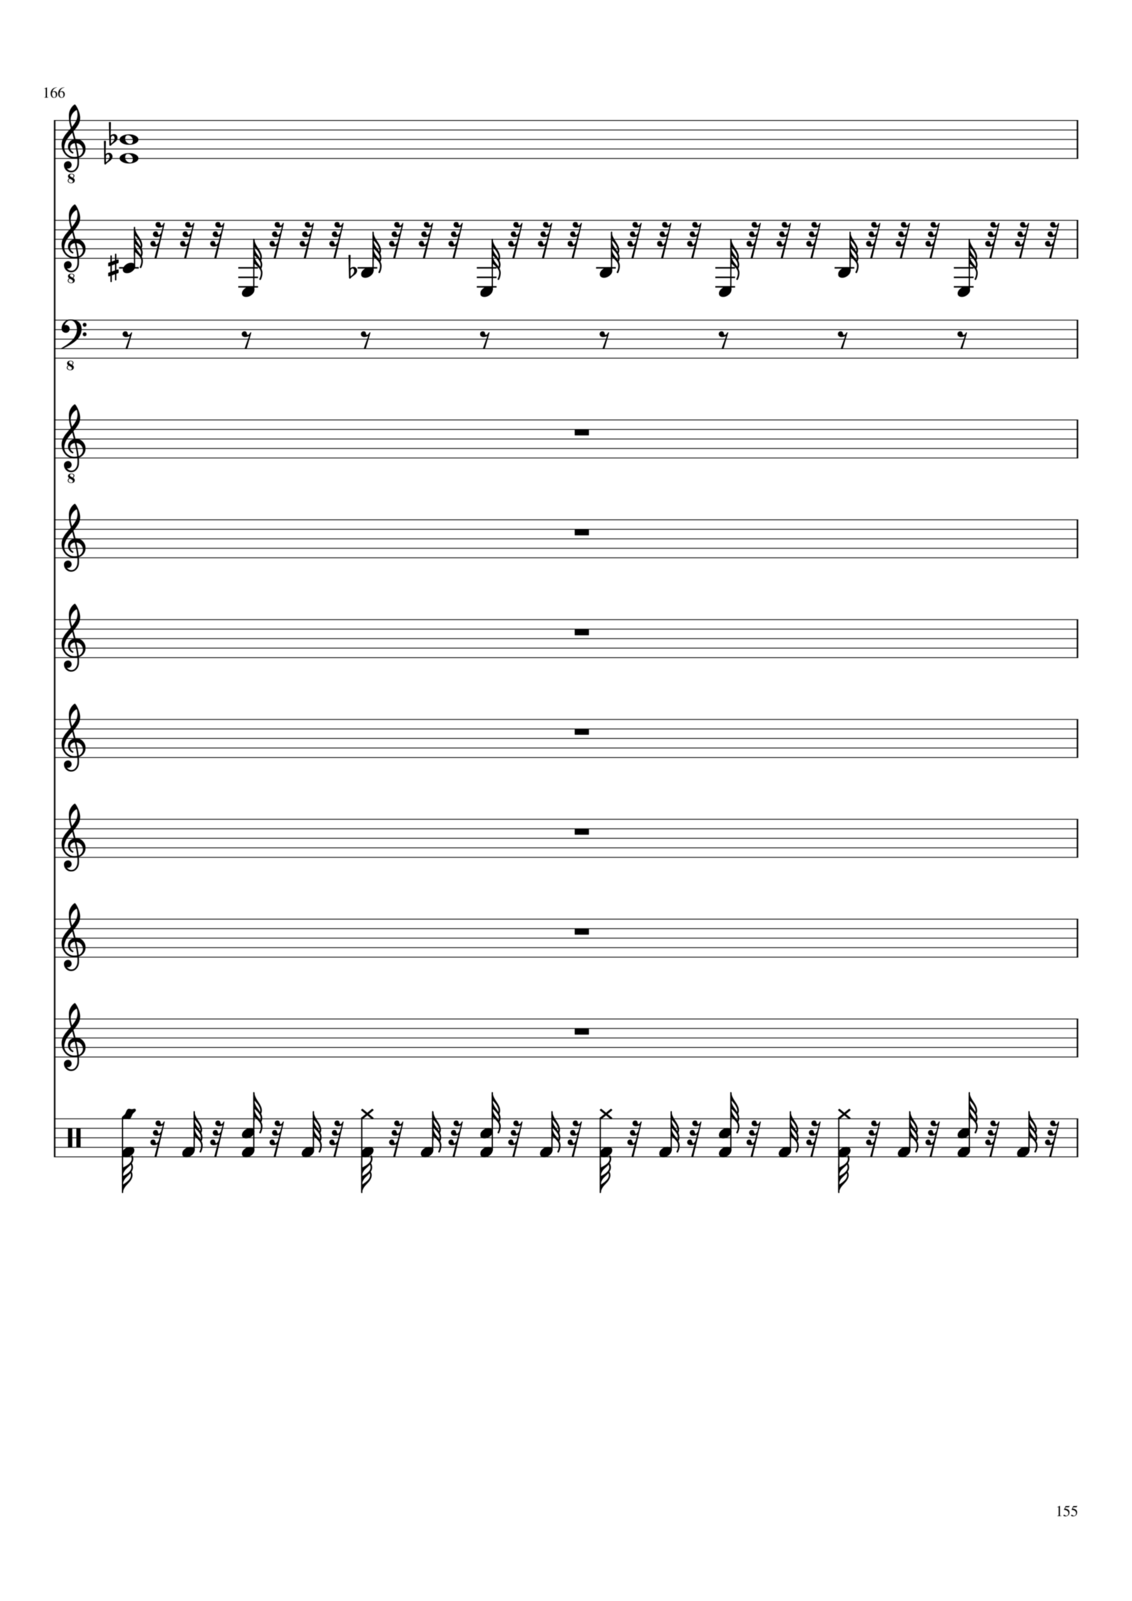 Belyiy sokol slide, Image 155